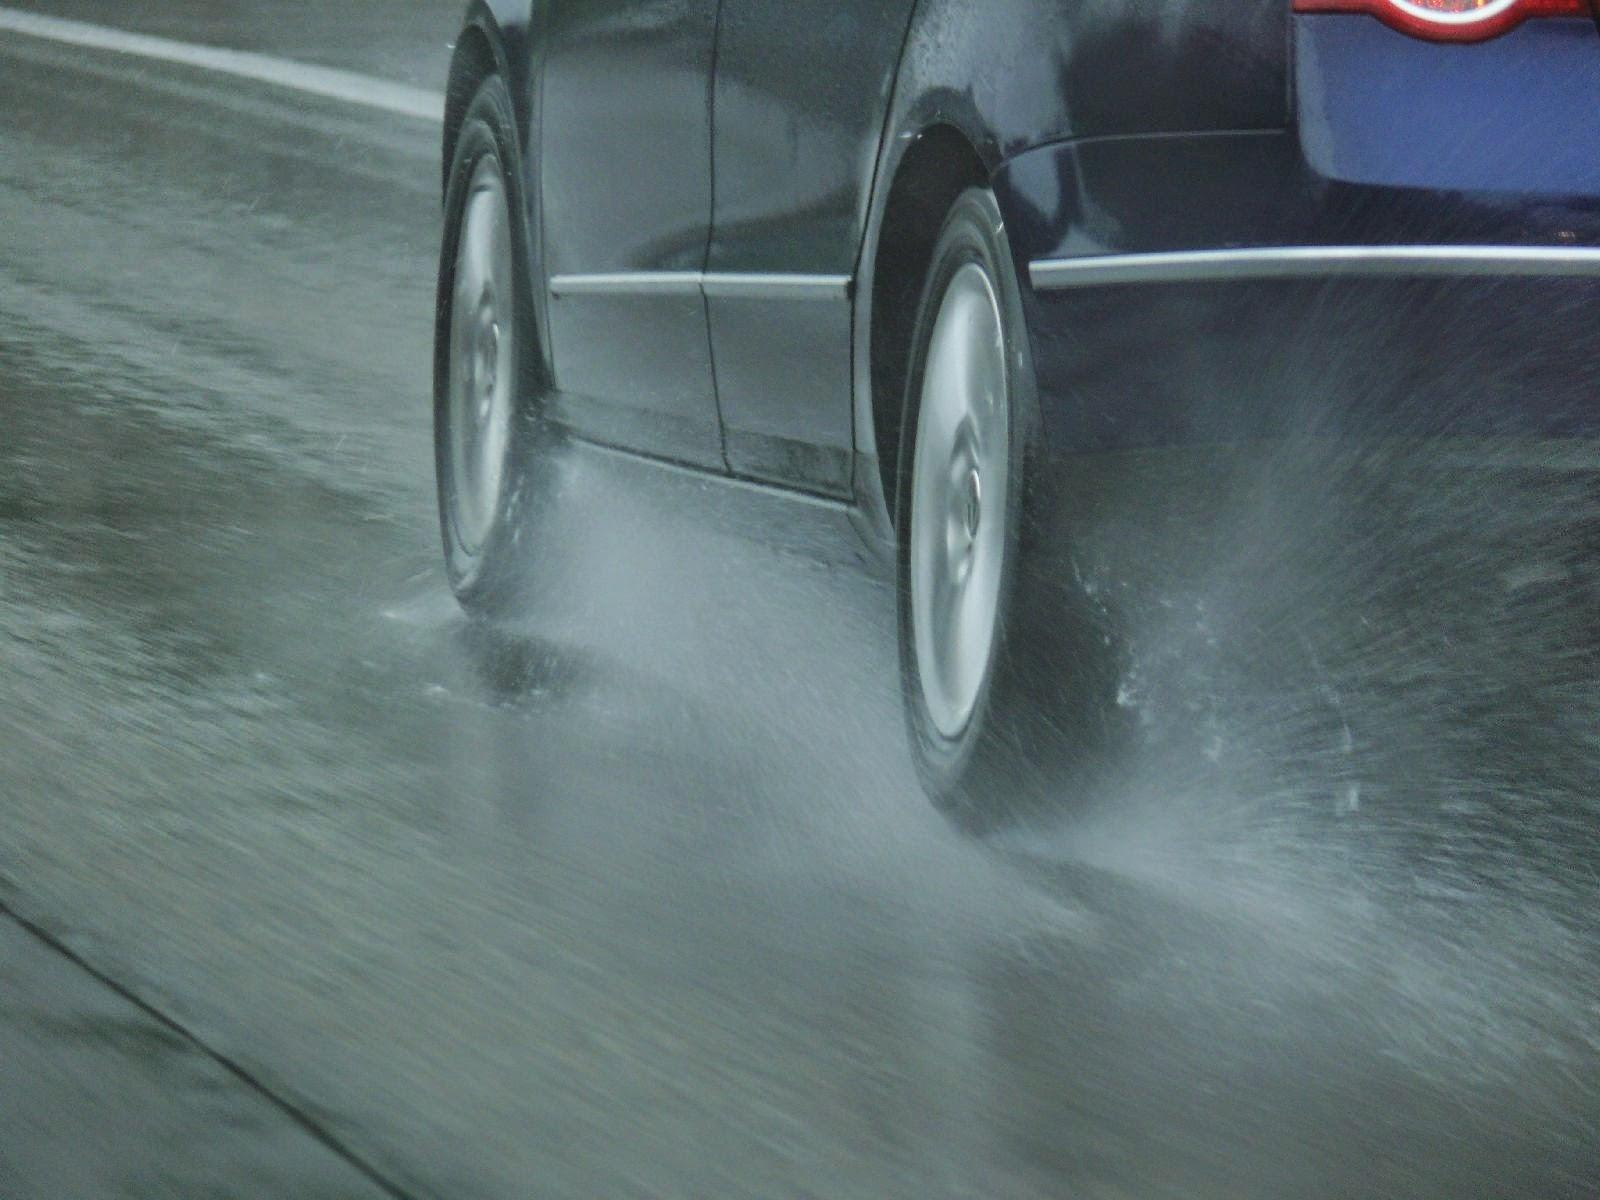 Evita derrapar en la lluvia! « #AUTOFAME Blog